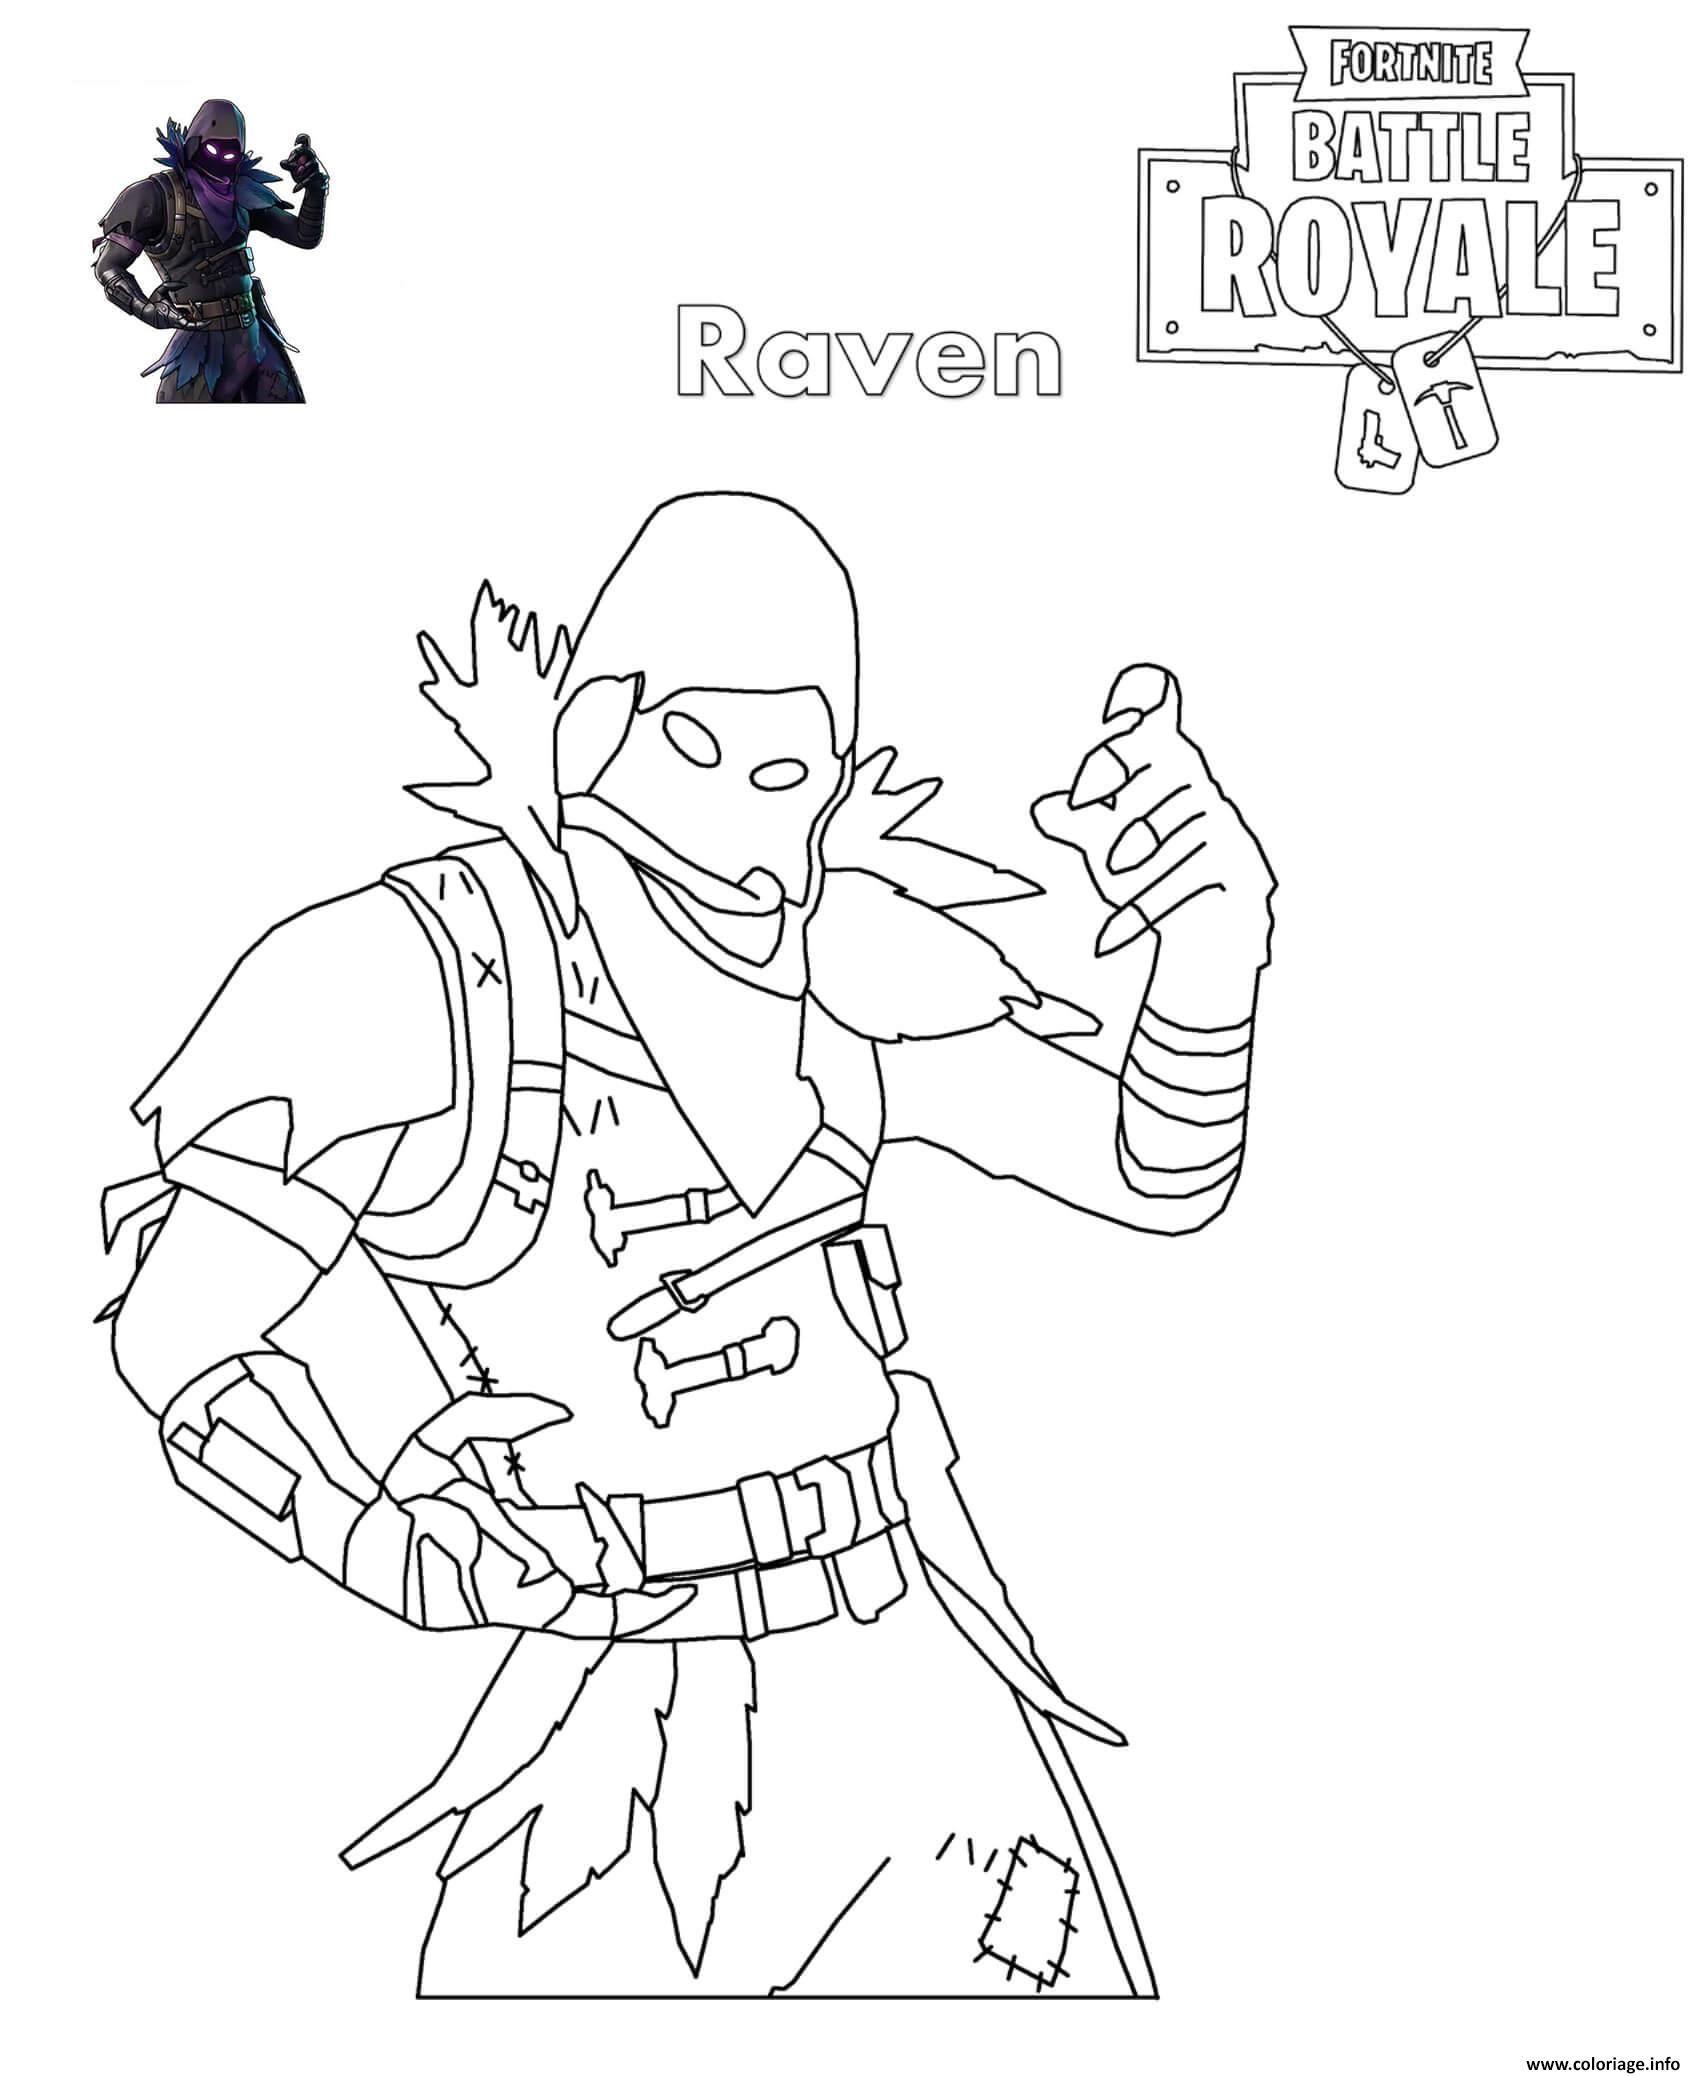 Coloriage Figurine Pop Fortnite.Coloriage Fortnite Raven Dessin A Imprimer Activites Creations De